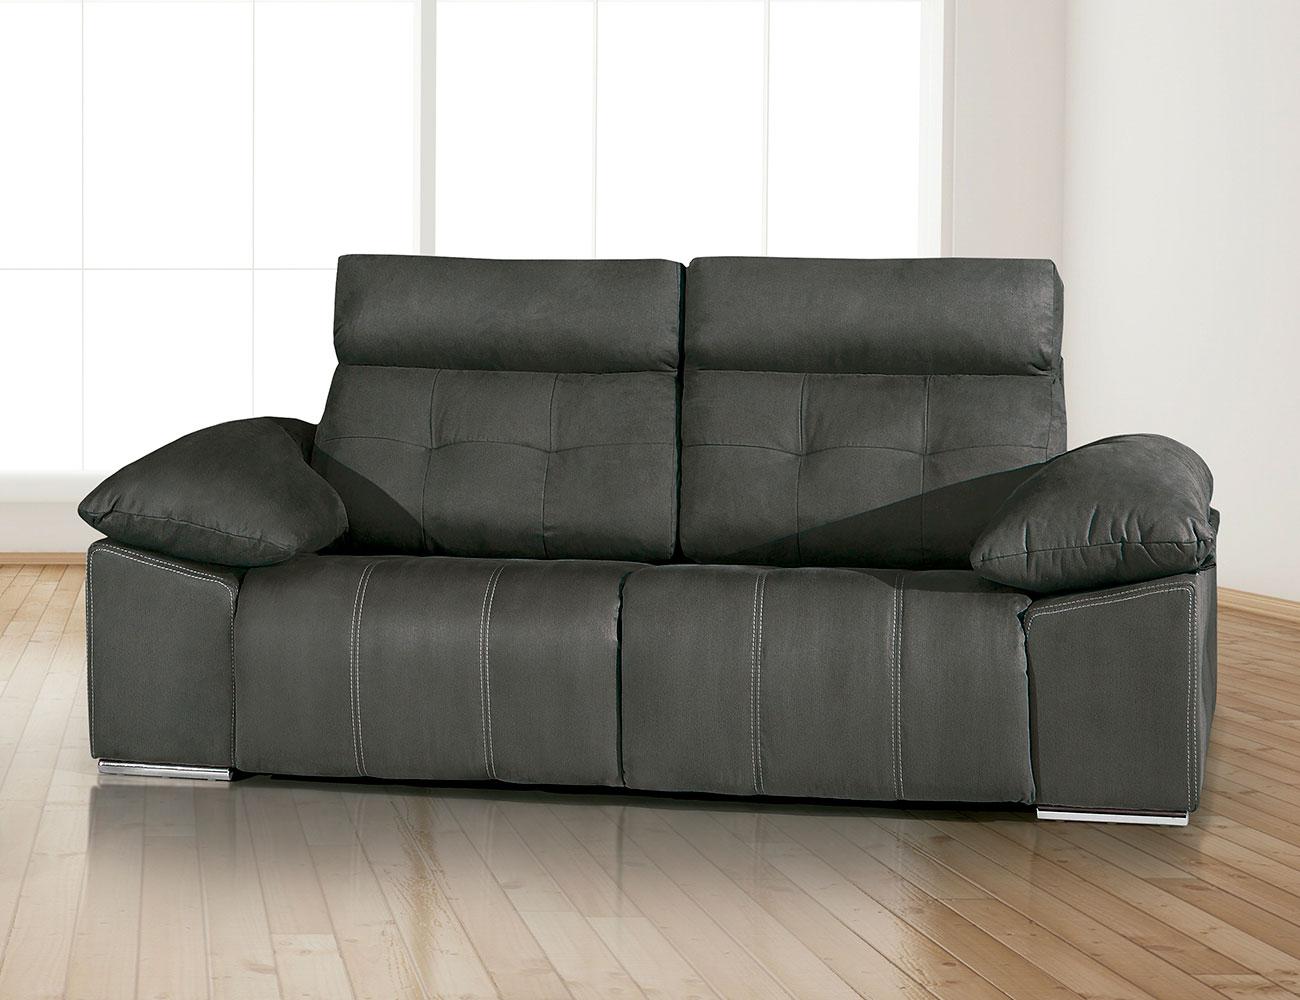 Sofa 3 plazas electrico tejido dante4